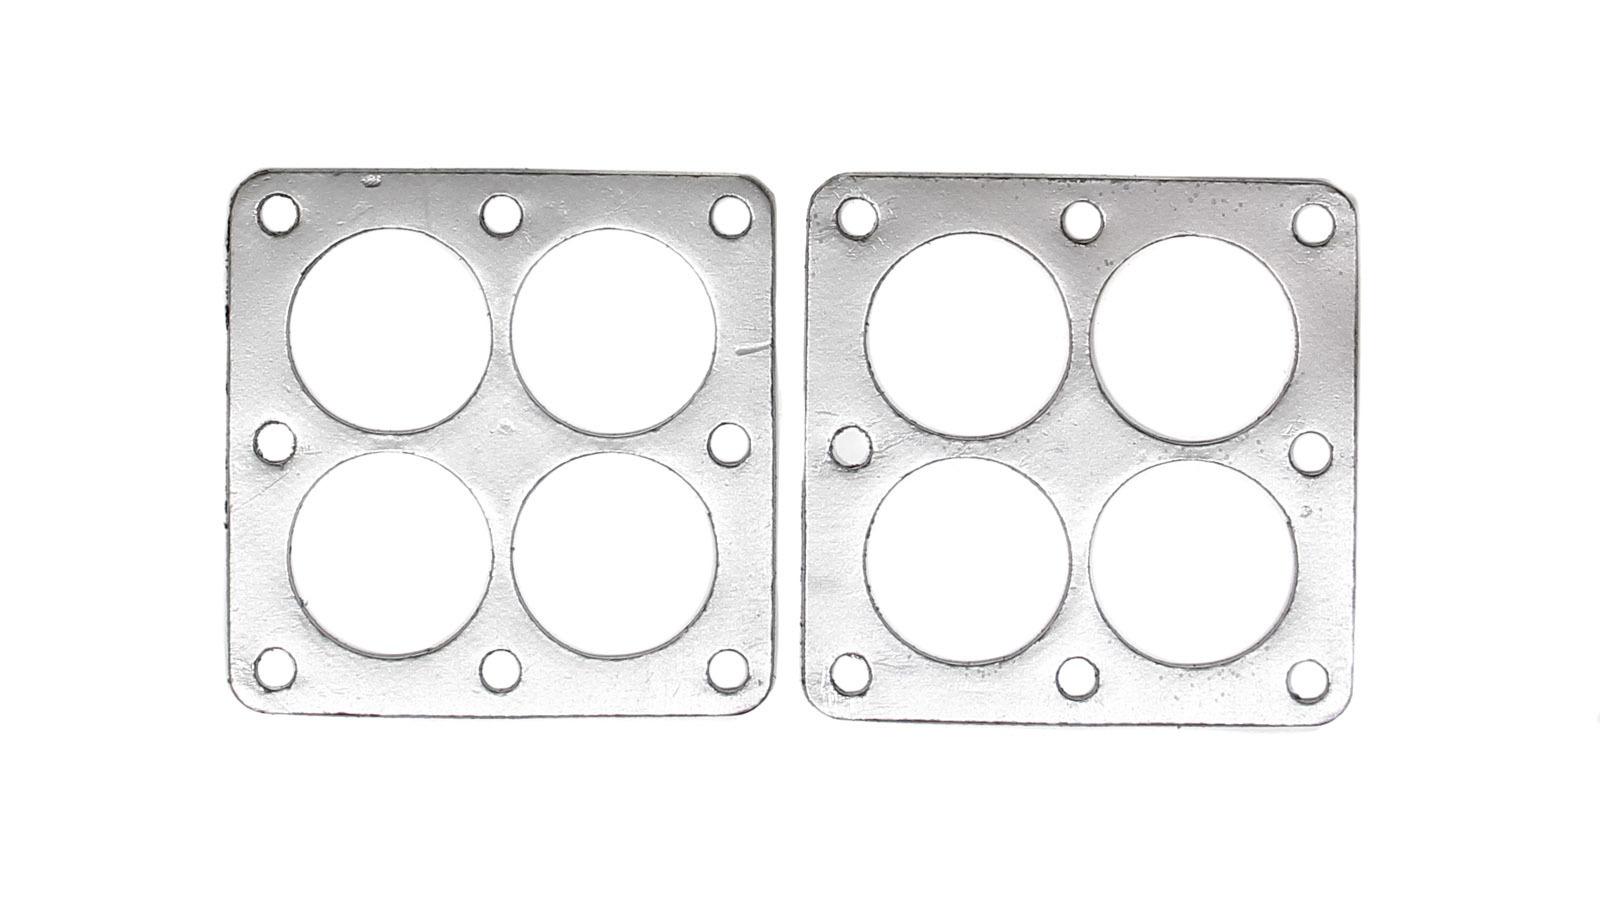 Remflex Exhaust Gaskets 8032 Collector Gasket, 4 x 1-15/16 in Diameter, 8-Bolt, Graphite, Each